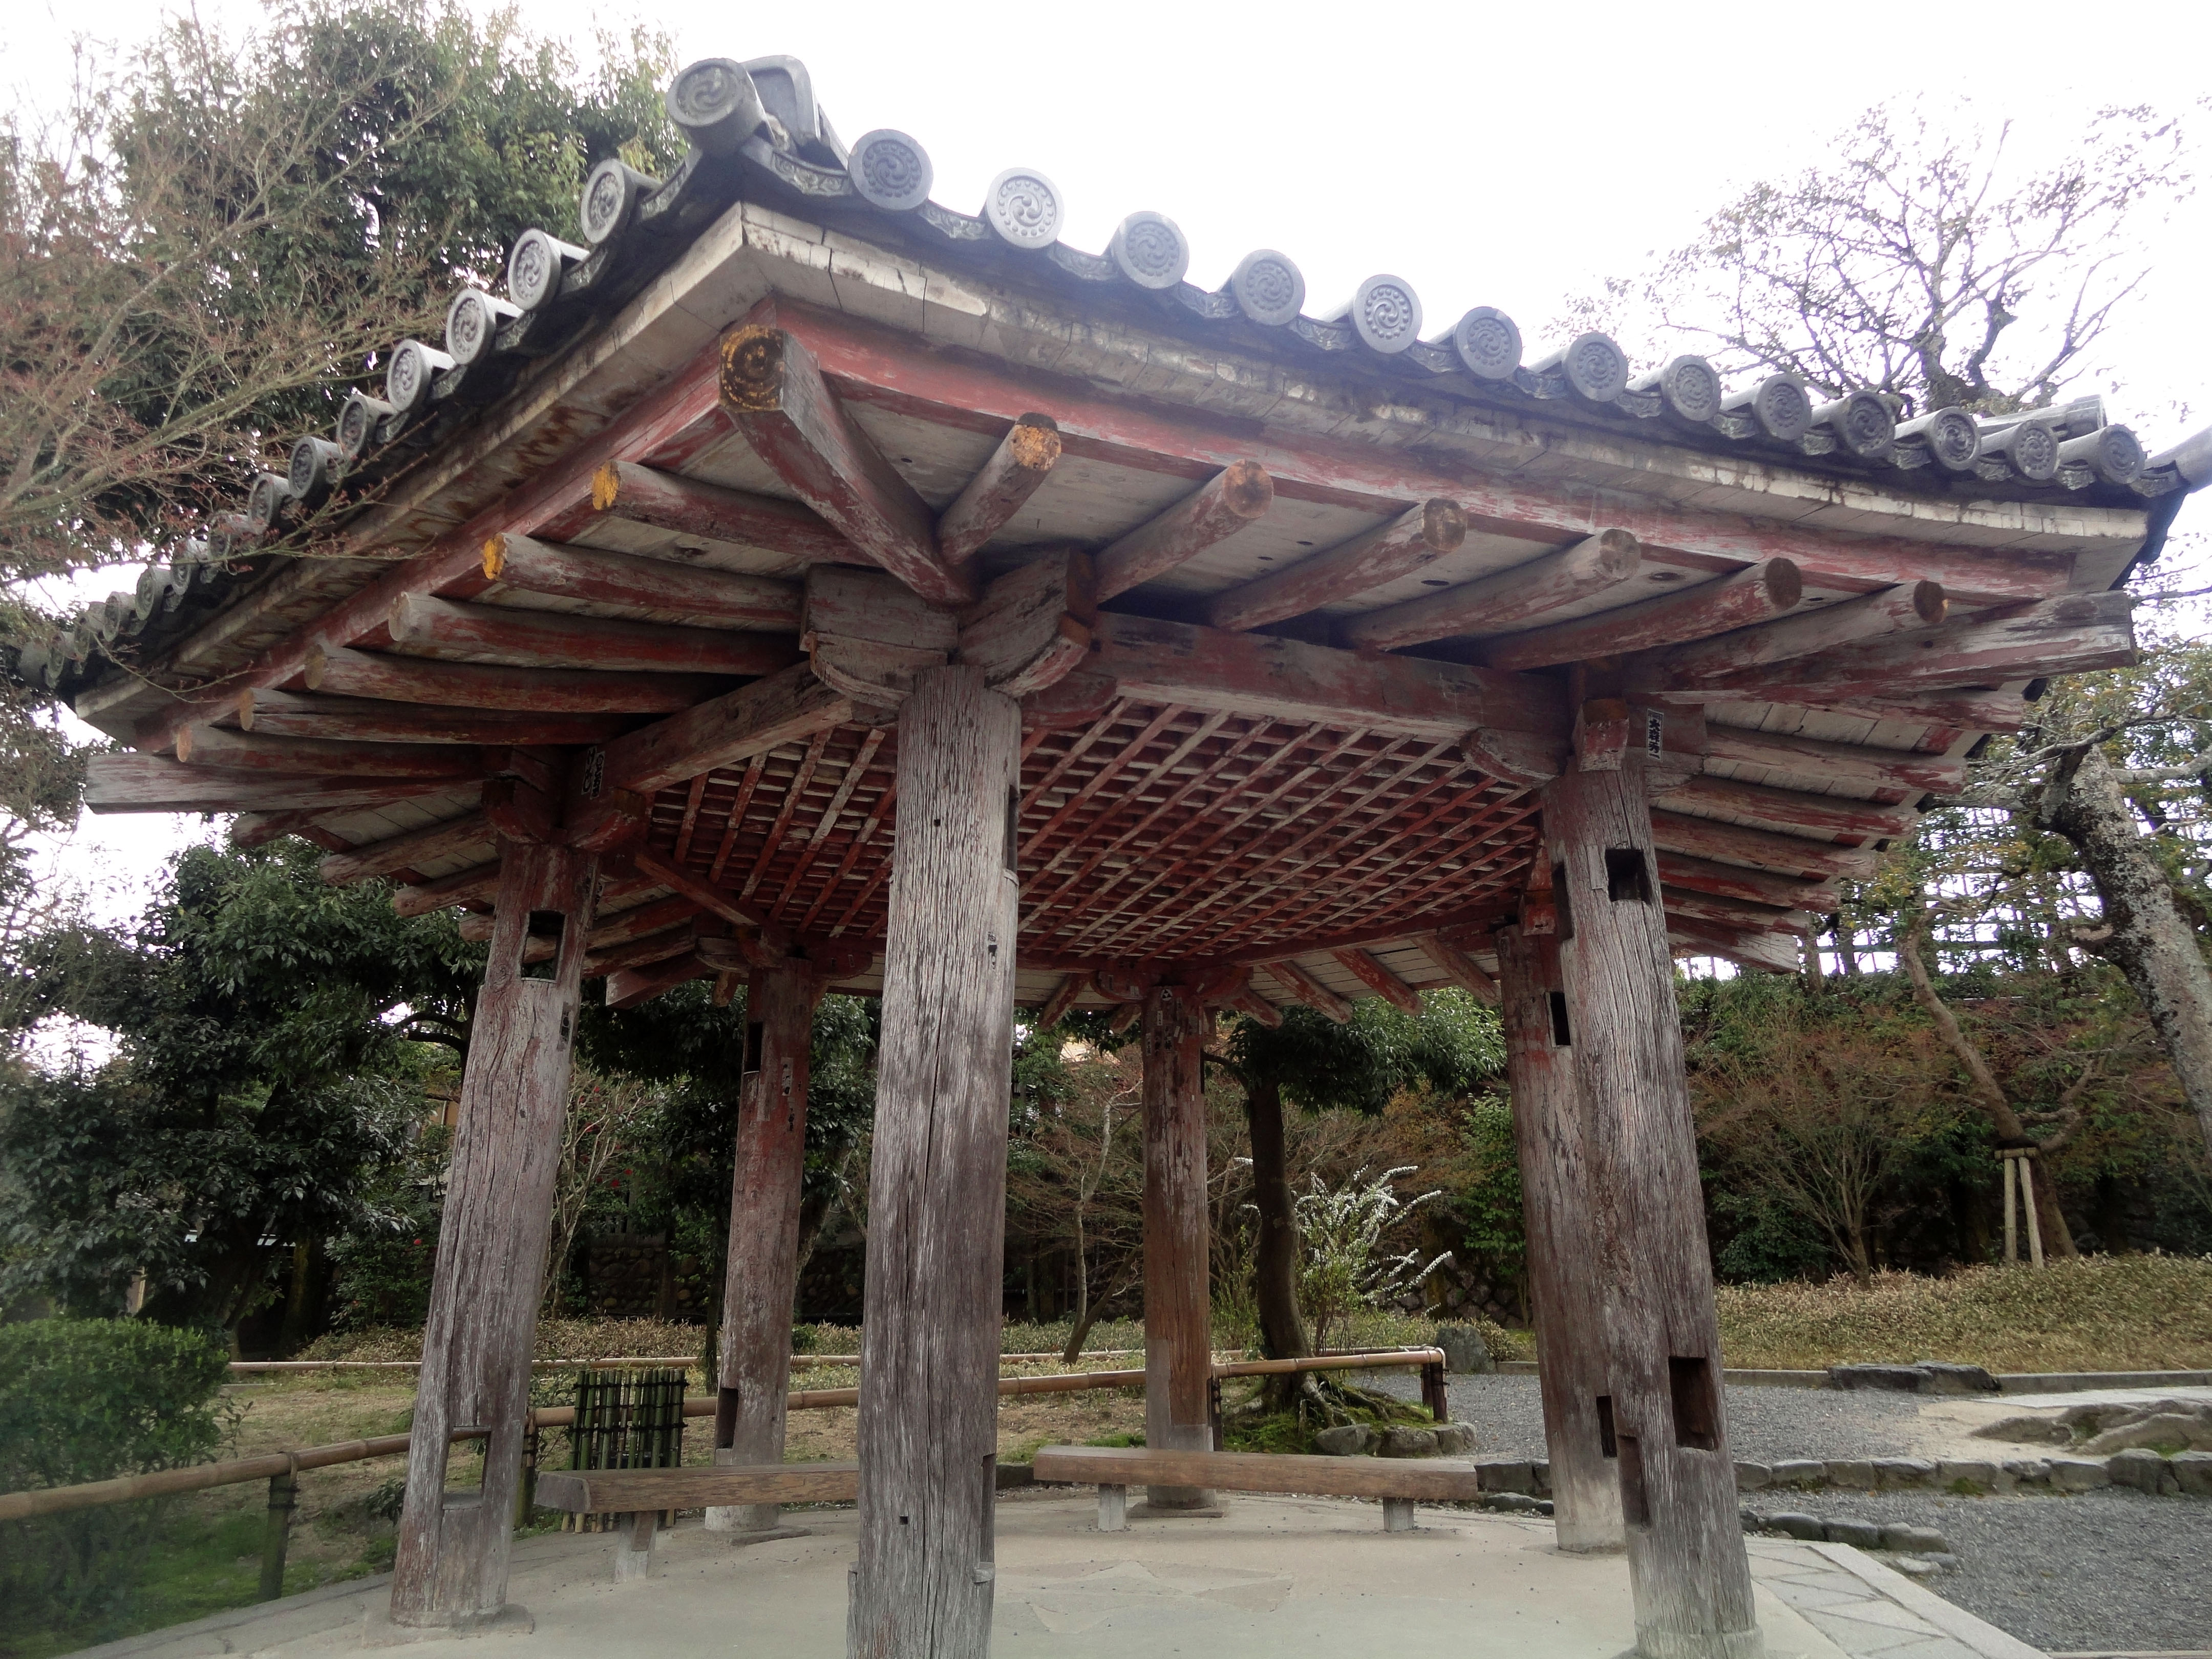 Byodo in Buddhist Jodo shiki garden Gazebo Kyoto Japan 01